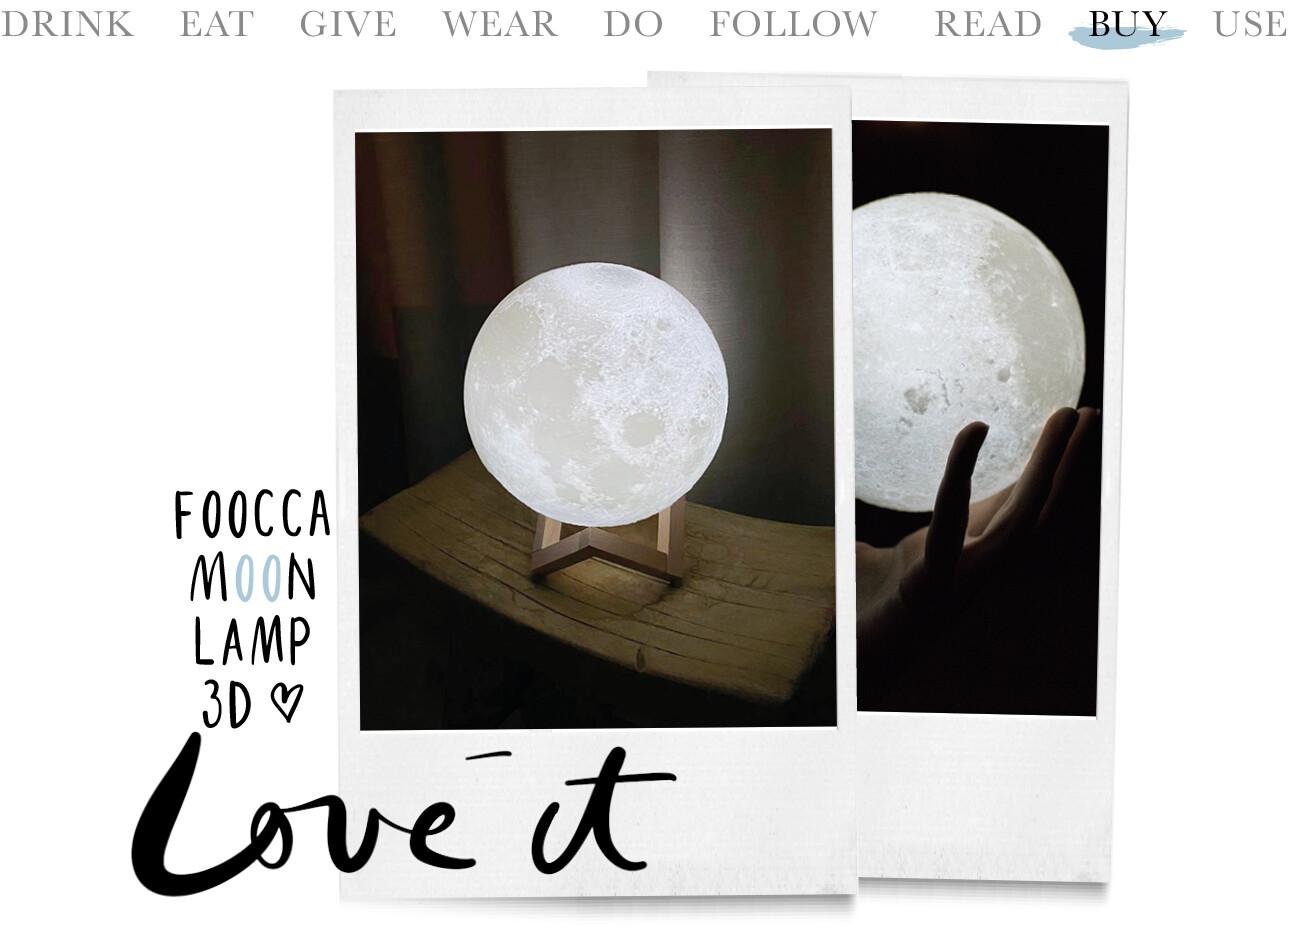 foocca moonlamp 3D